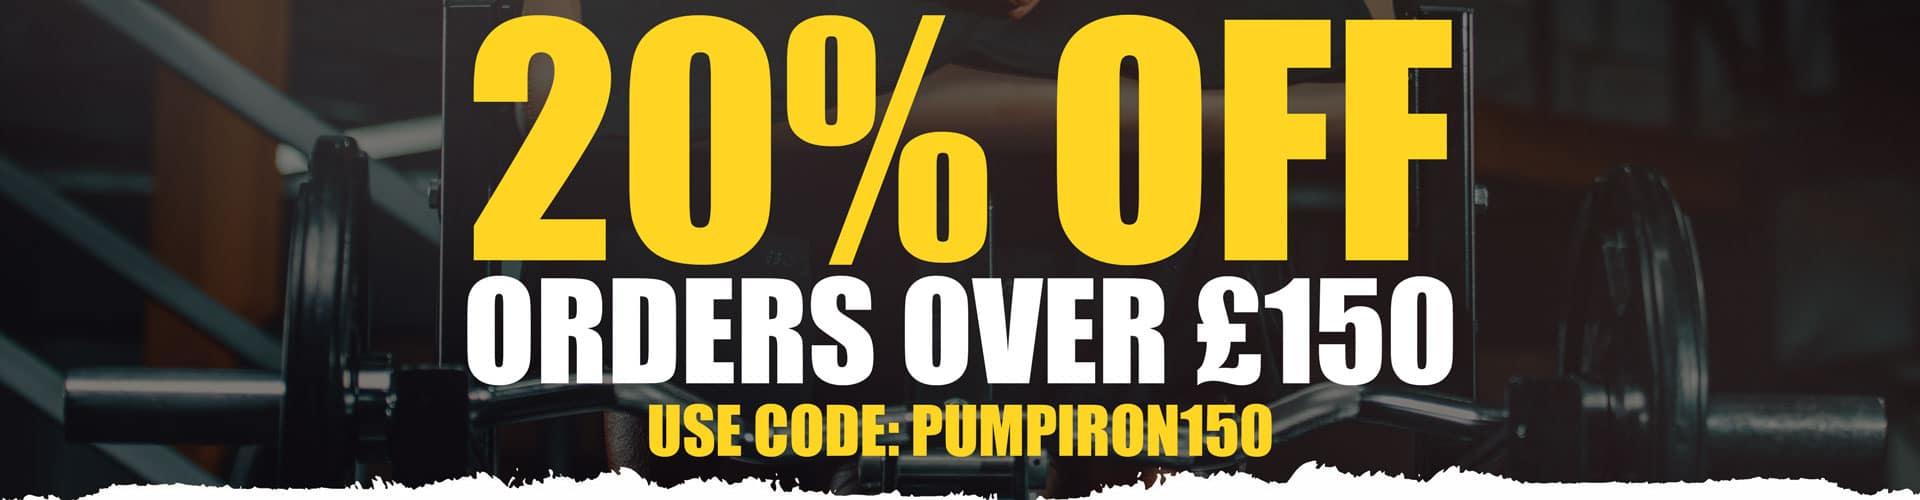 Pumping Iron Discount Code 150